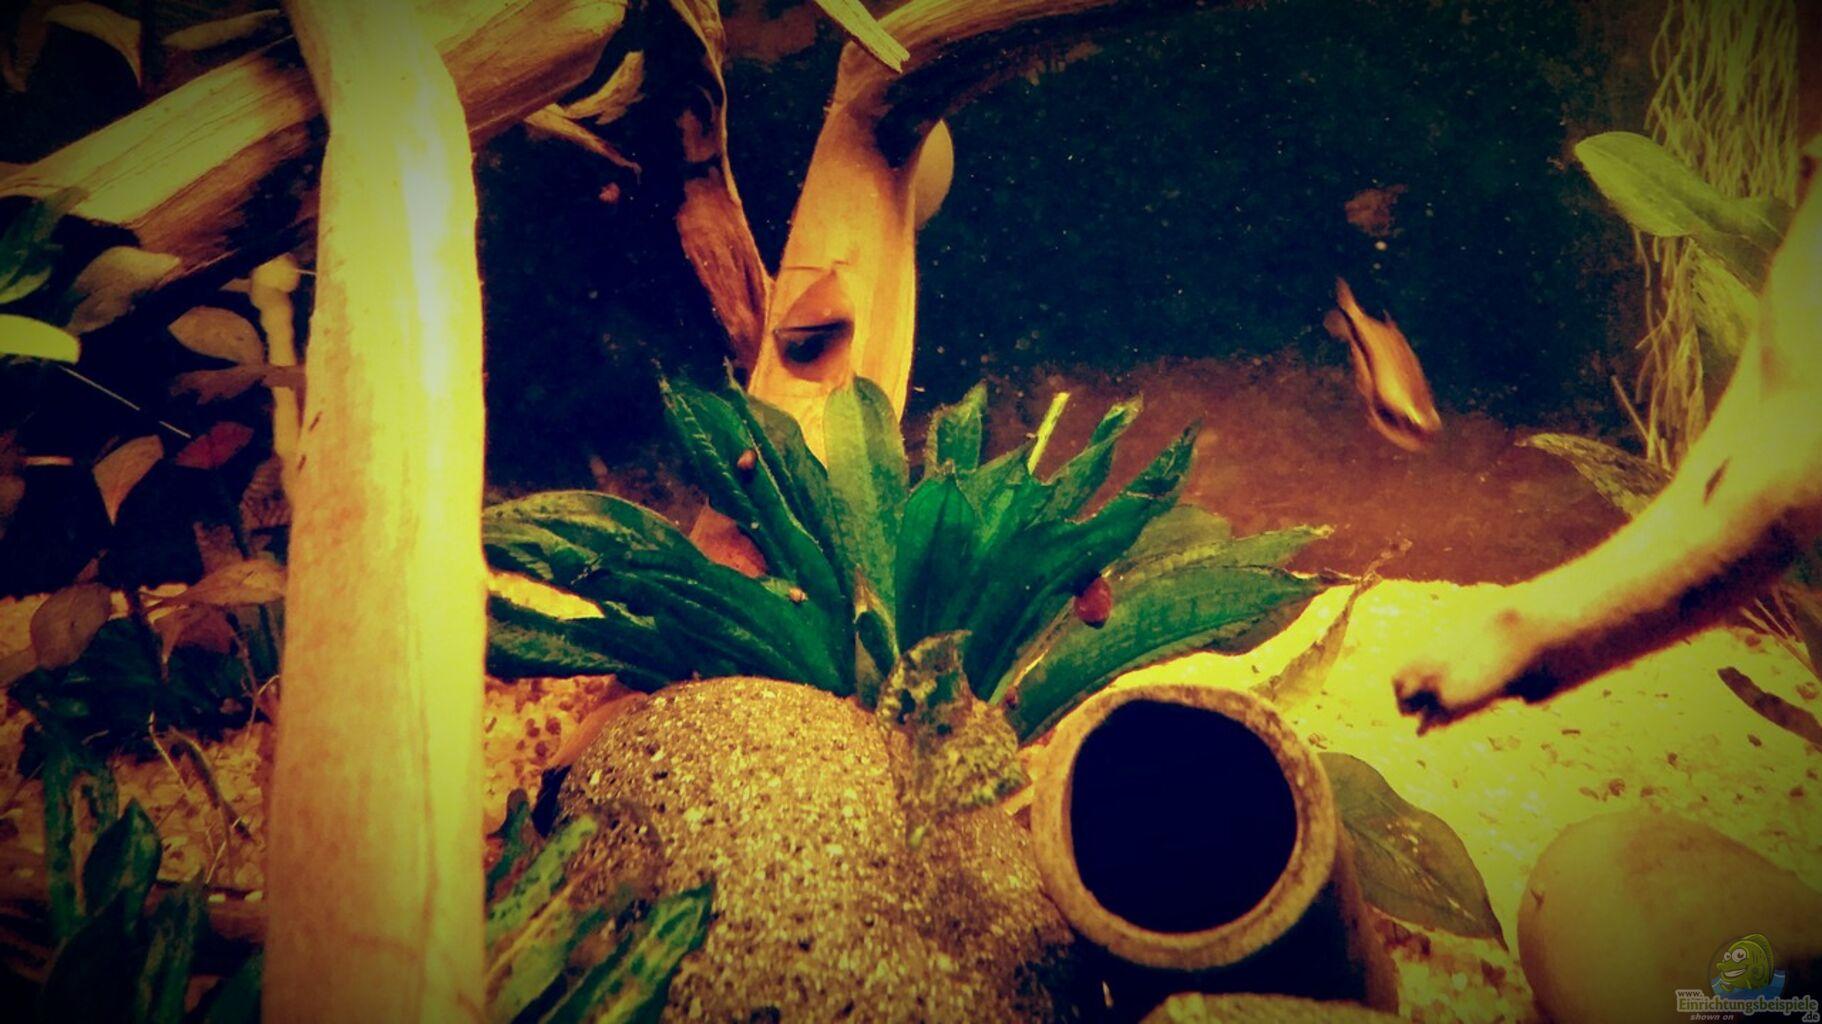 pflanzen im aquarium amazonas regenzeit aus amazonas. Black Bedroom Furniture Sets. Home Design Ideas